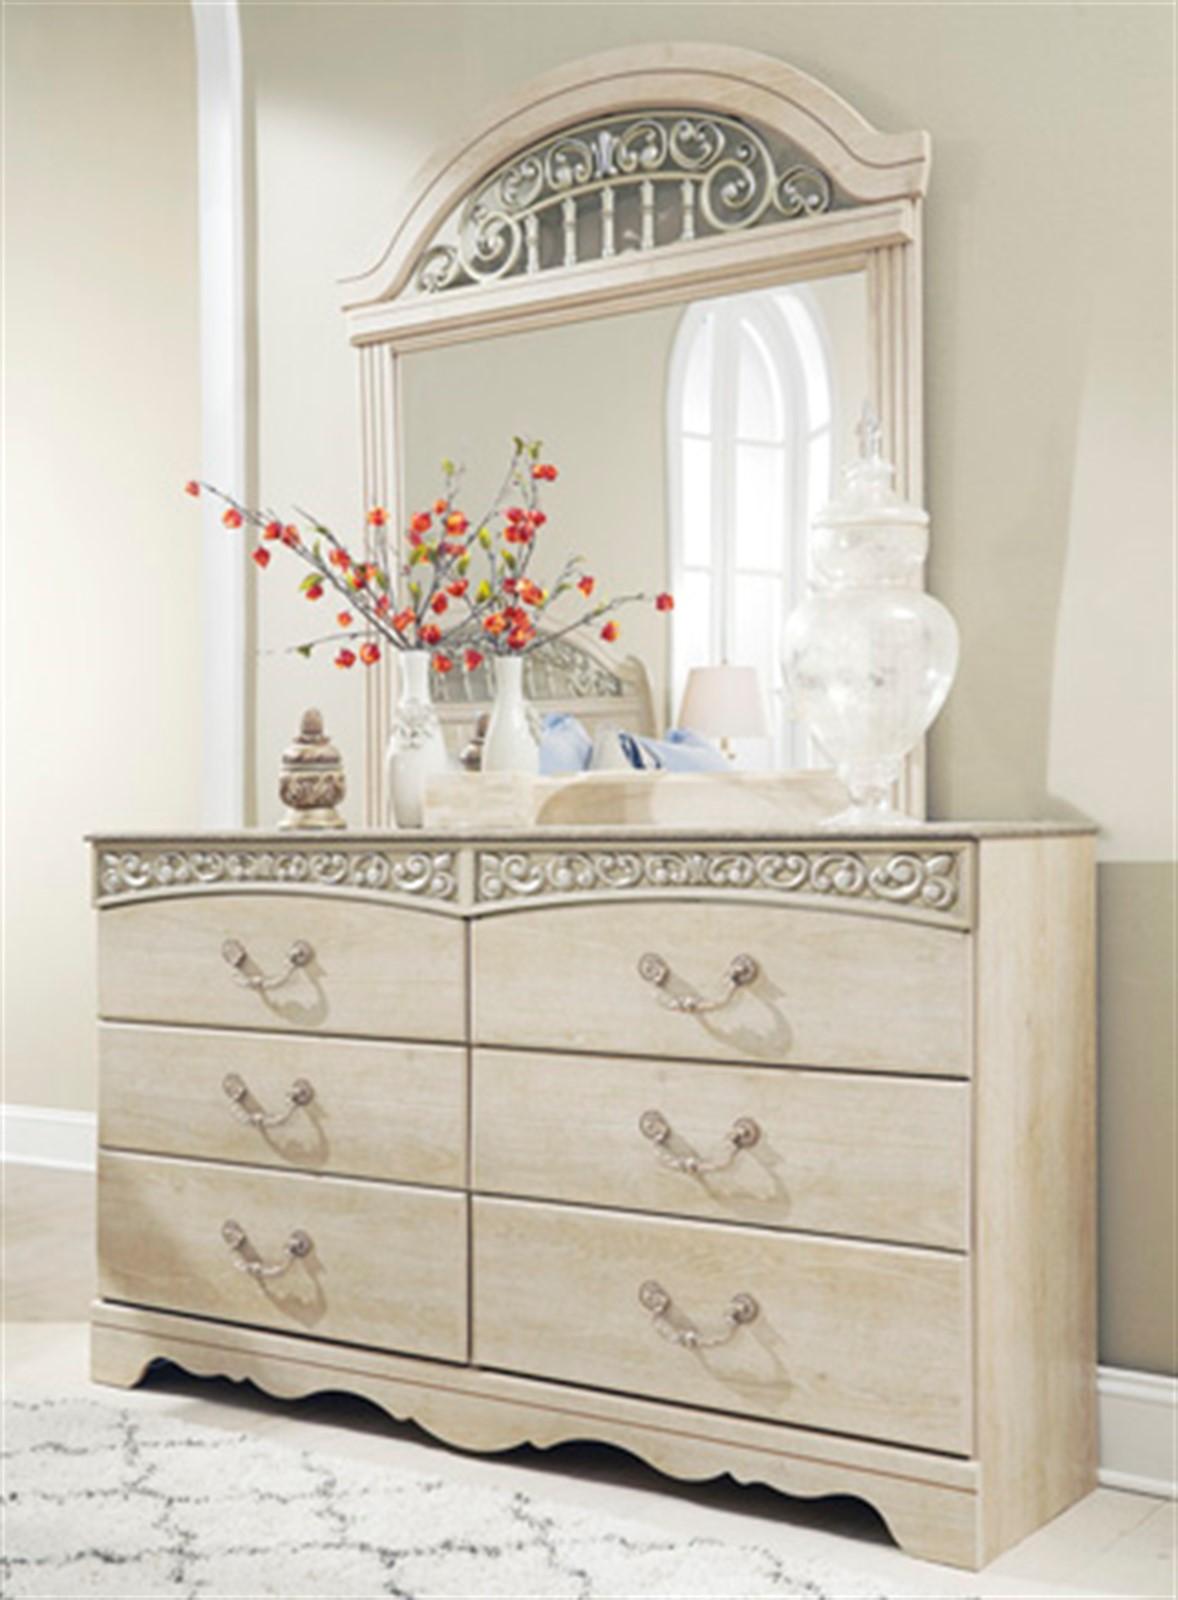 Catalina Dresser and Mirror Set - Antique White